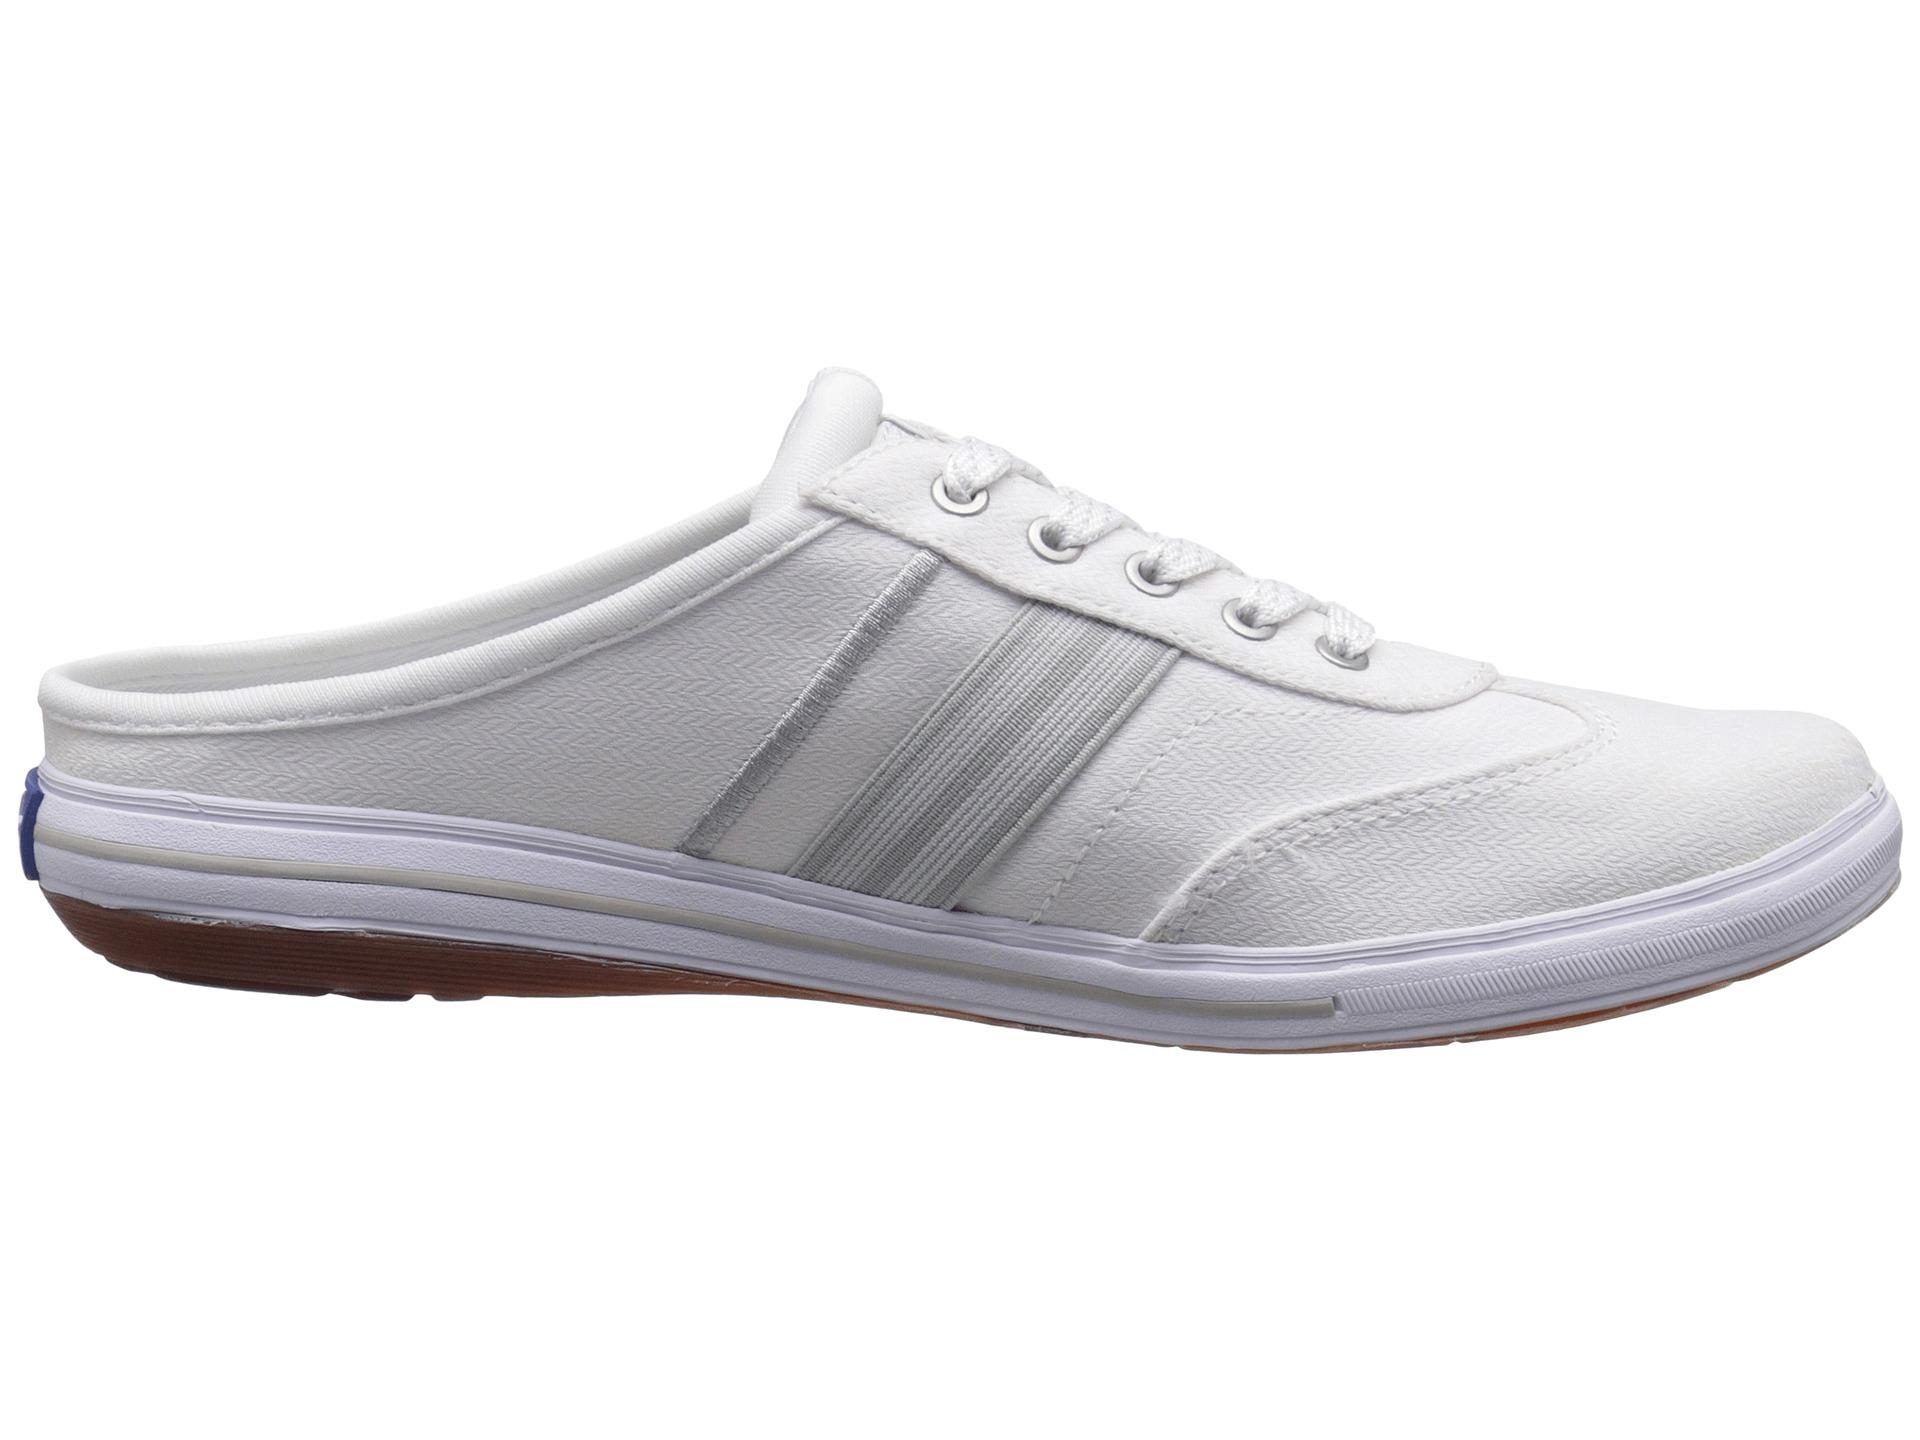 Slide In Tennis Shoes